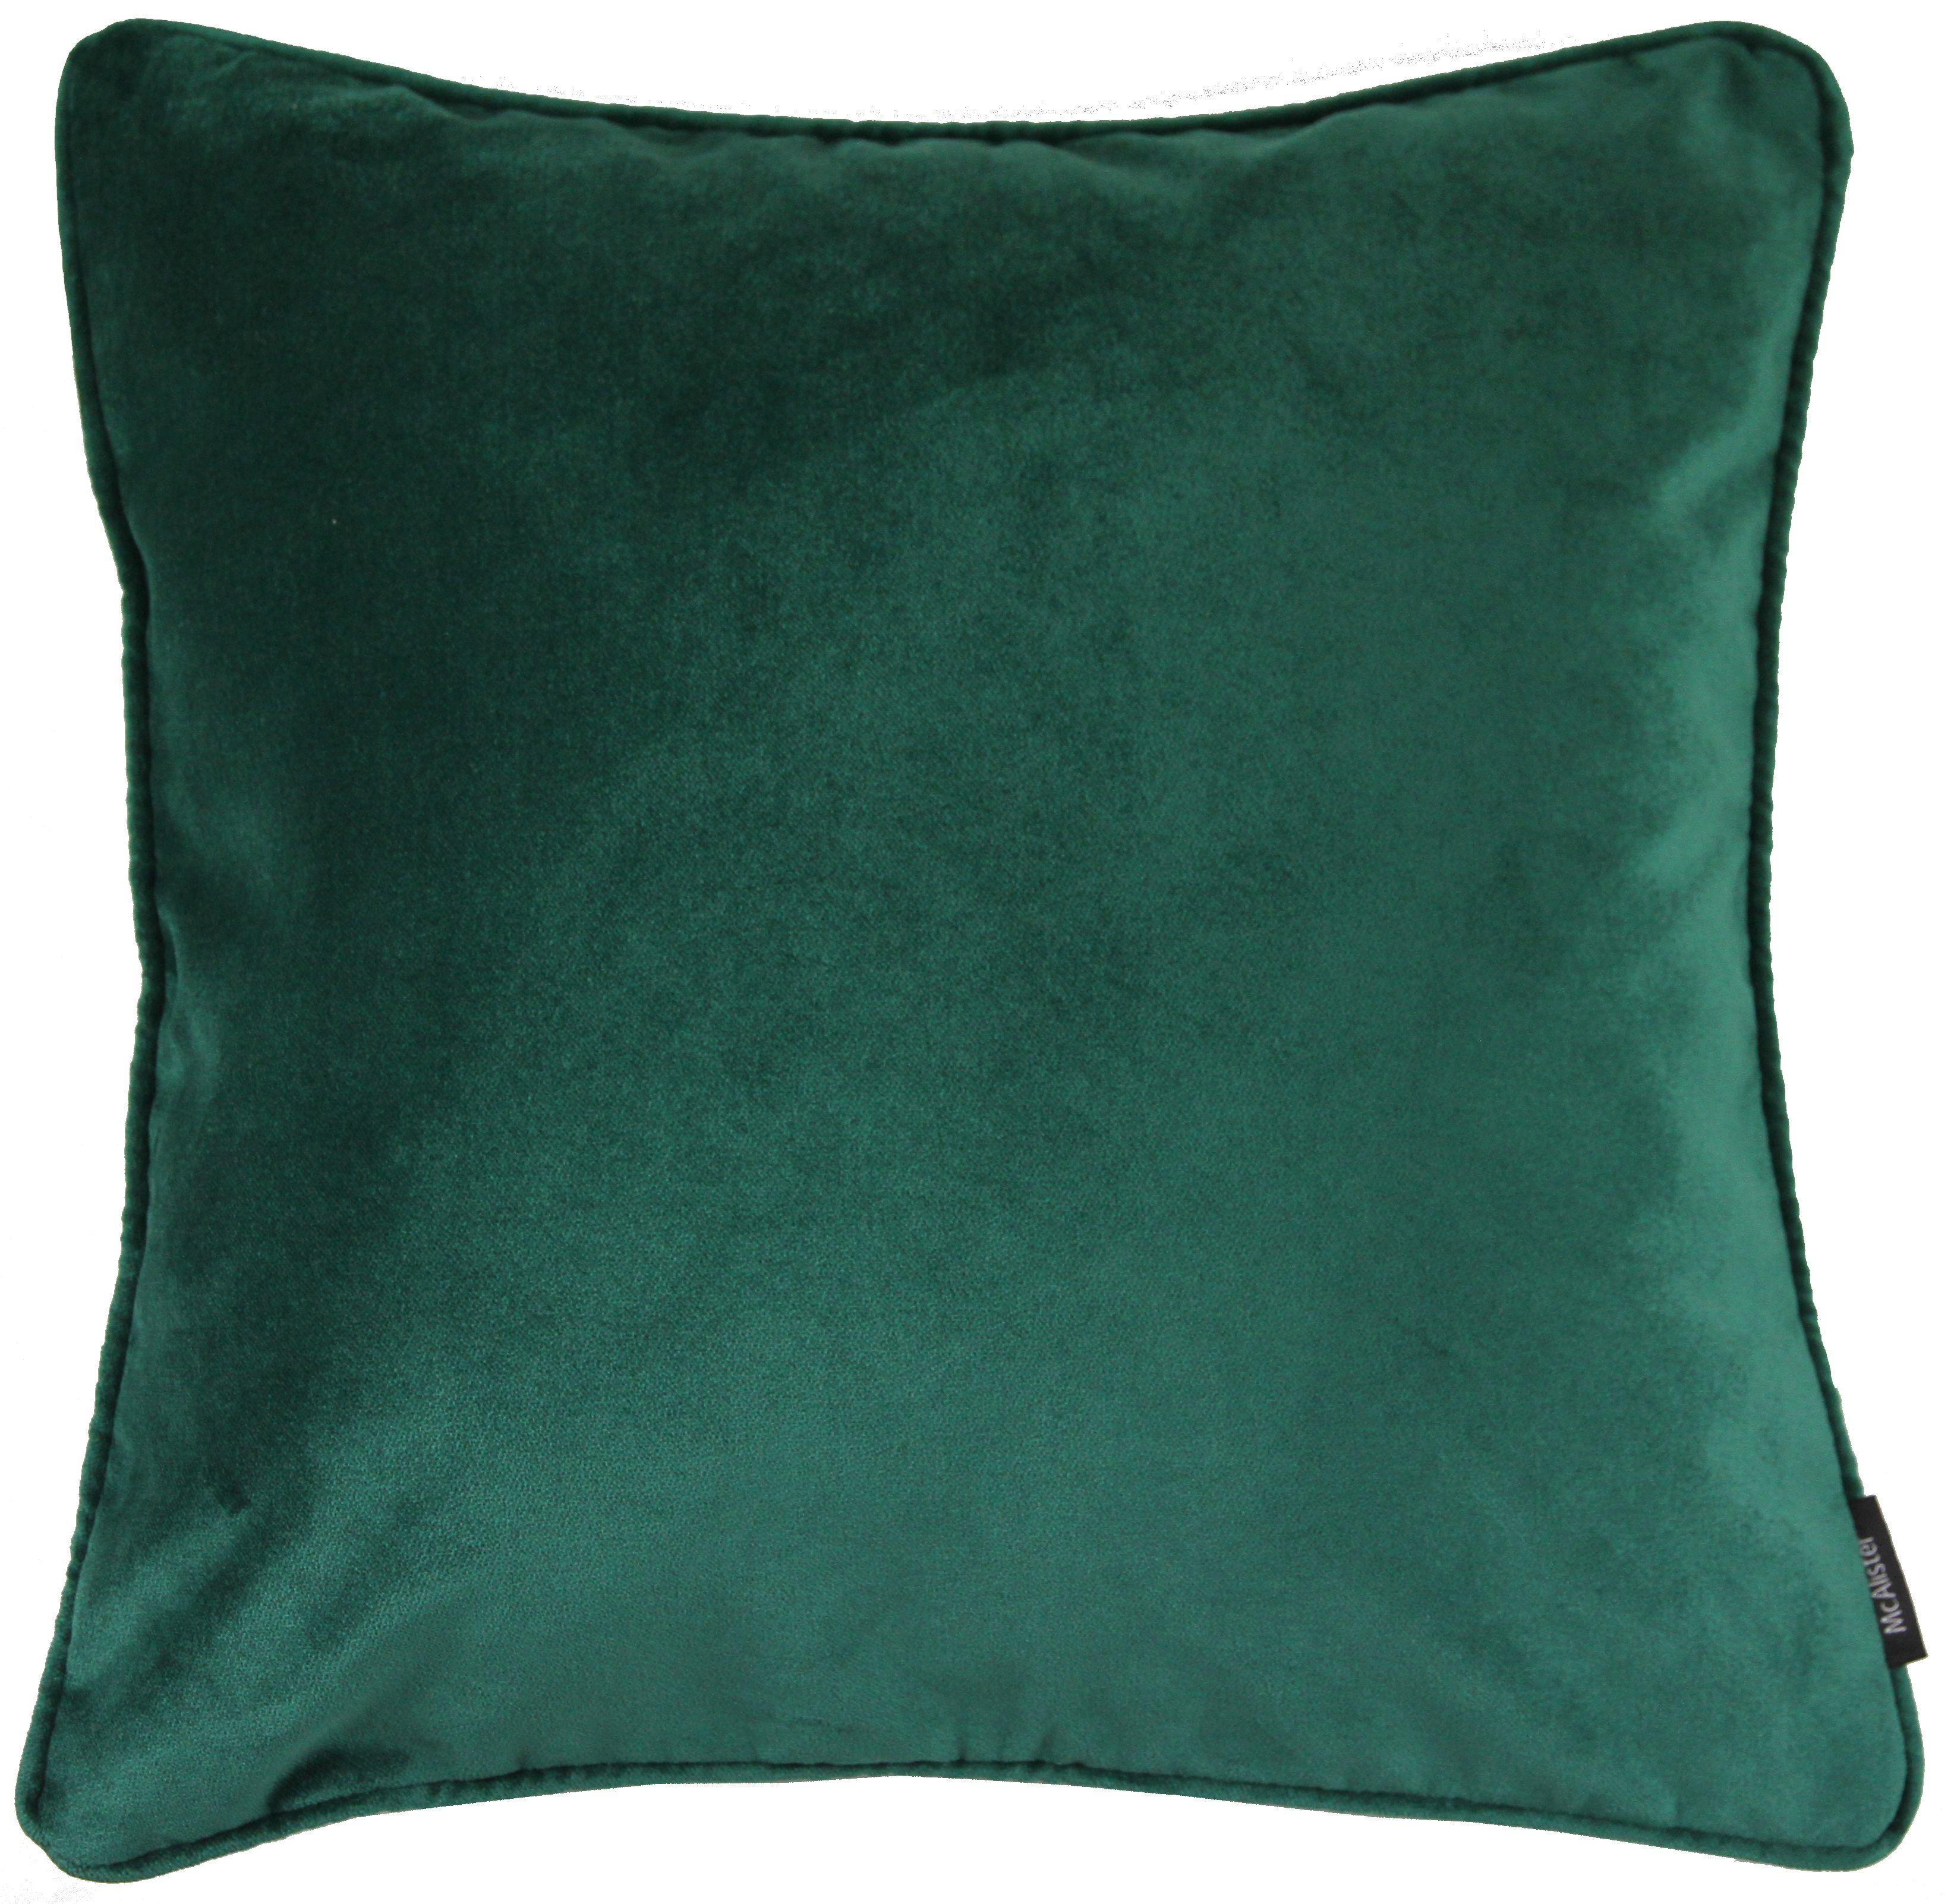 Emerald Green Velvet Decorative Pillow